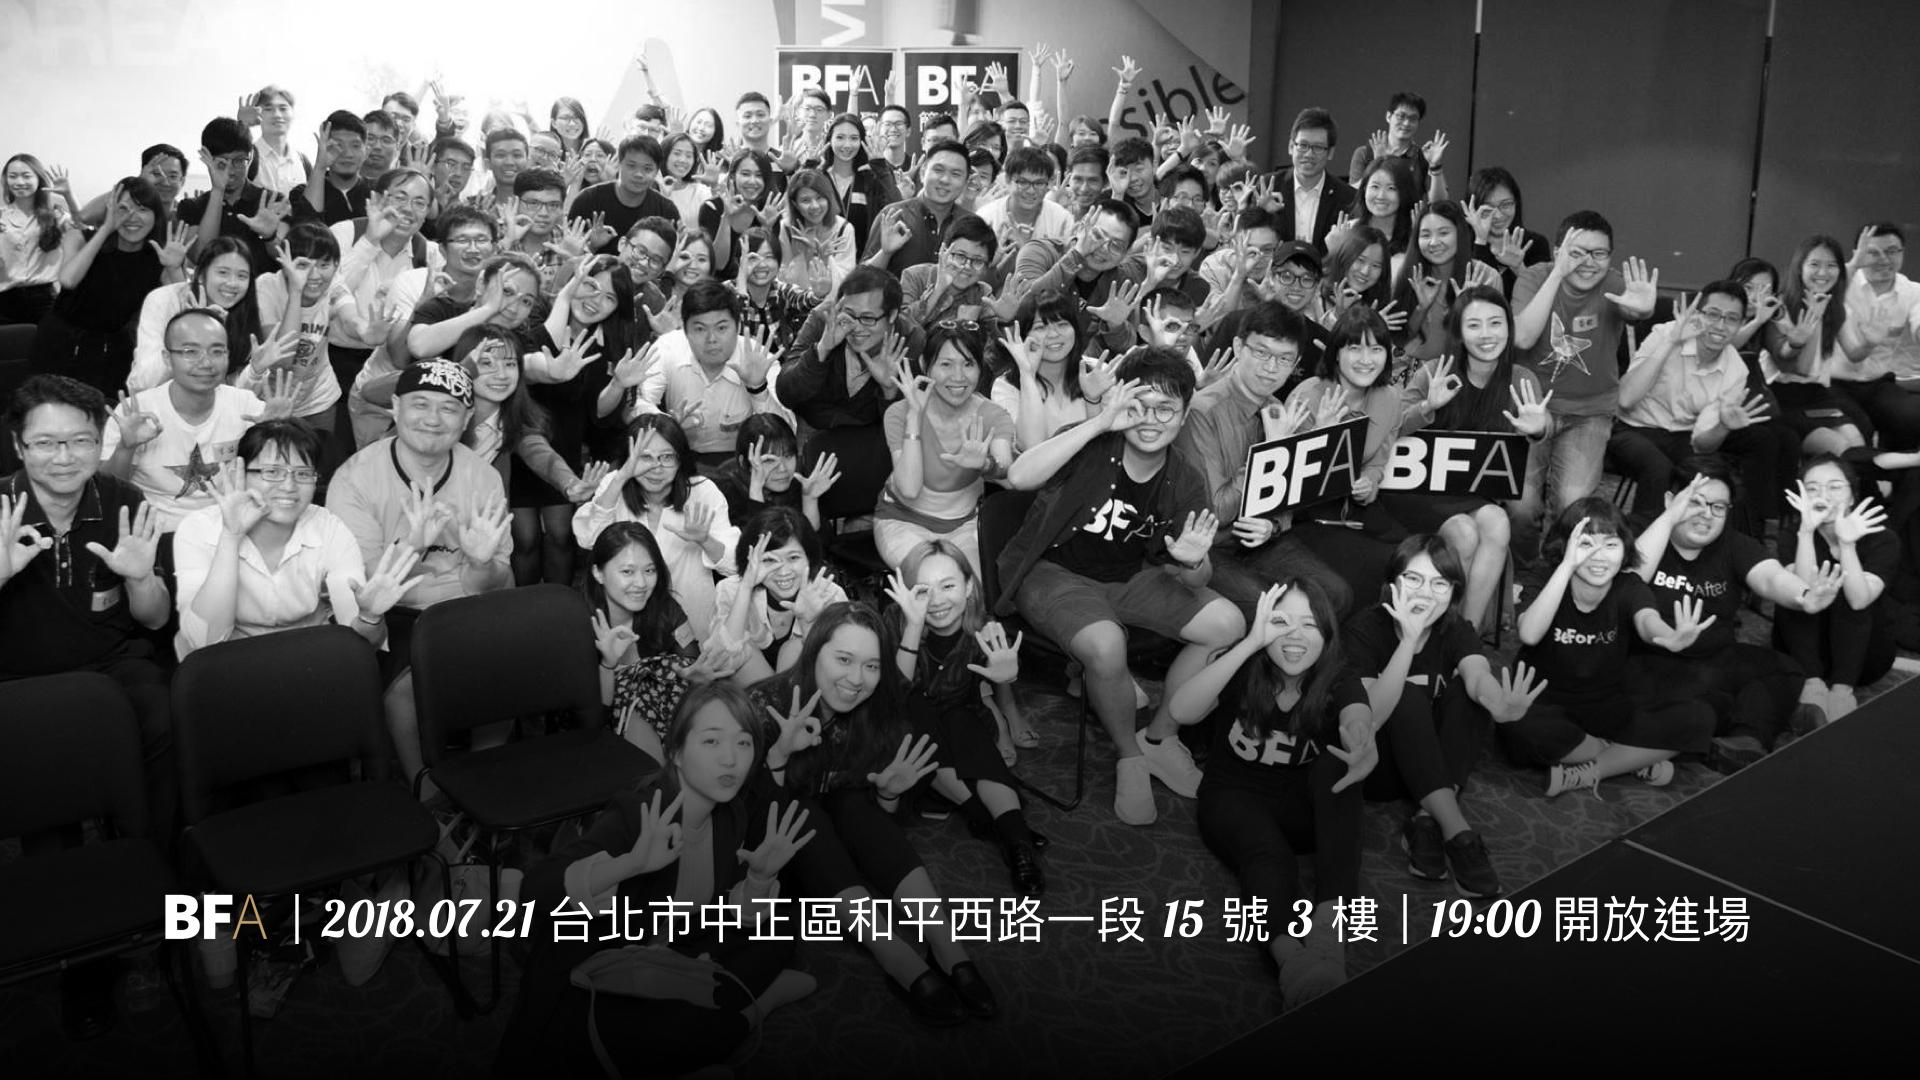 BFA 宣傳照.001.jpeg